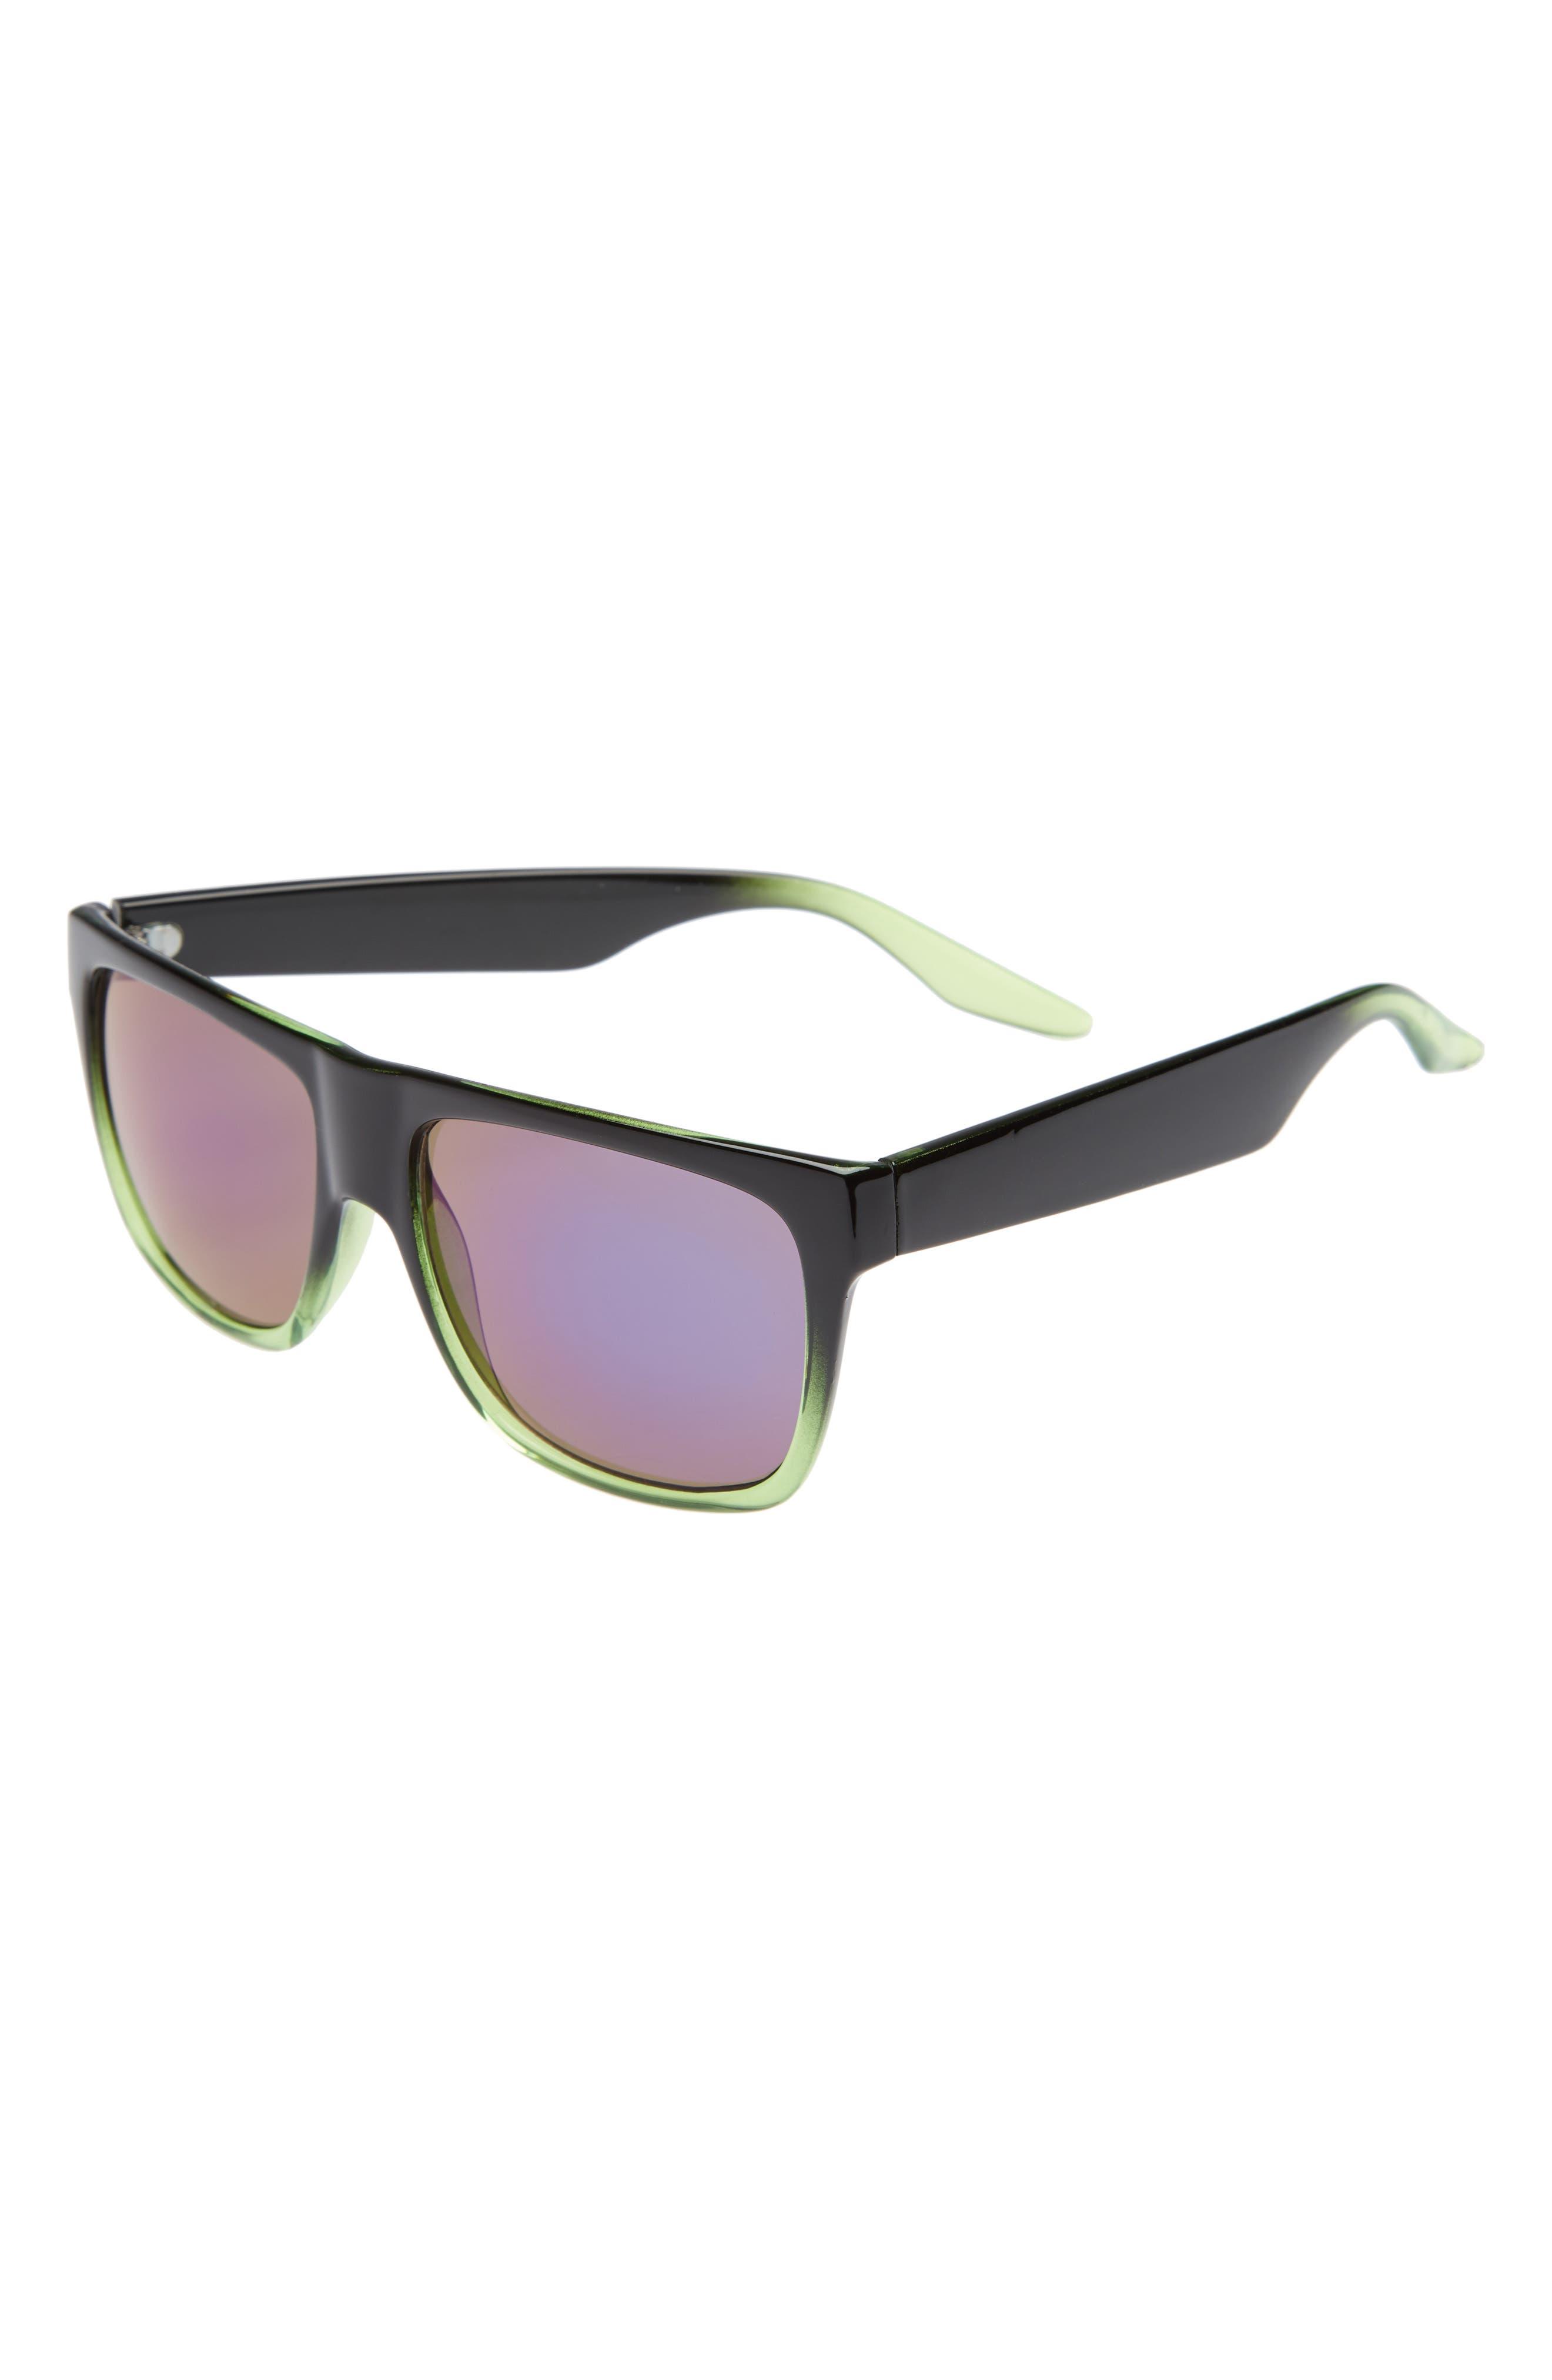 Ombré Frame Sunglasses,                         Main,                         color, Black/ Green Mirror